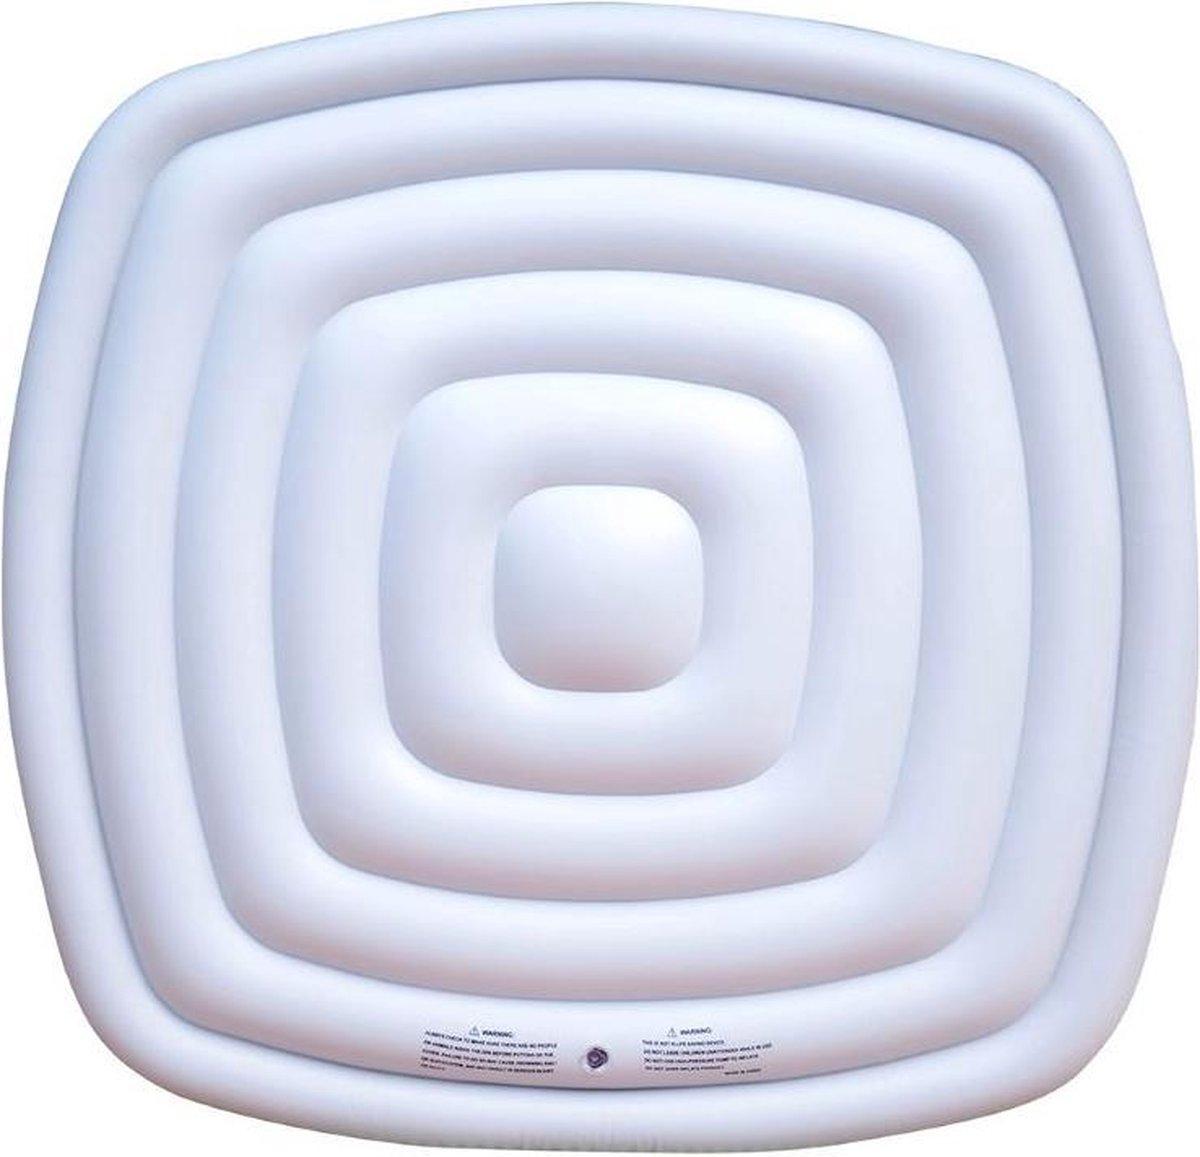 Opblaasbare isolatie deksel vierkant 6 persoons bubbelbad